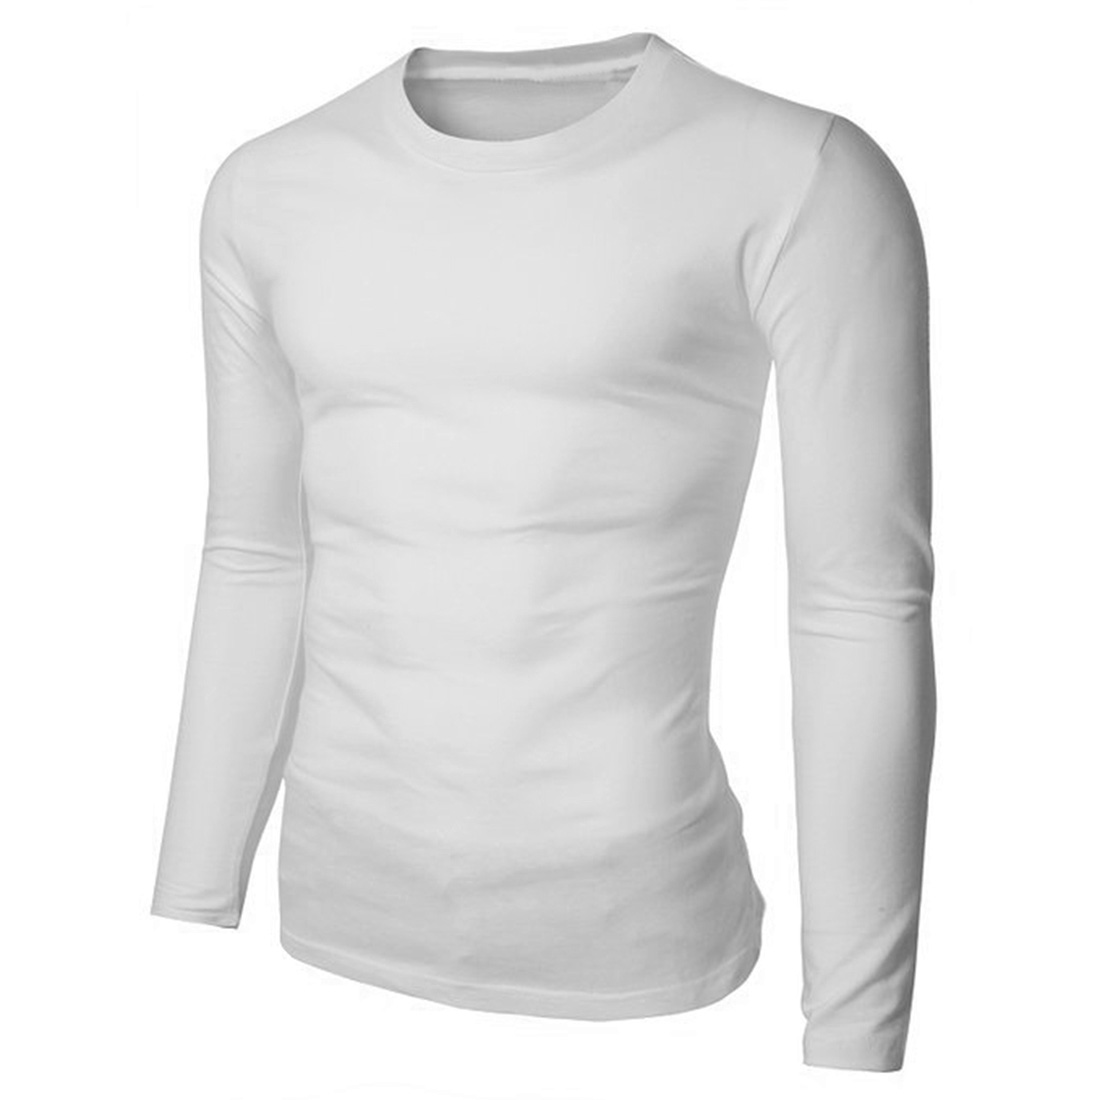 100% Cotton Mens Long Sleeve Plain T-Shirt Slim Fit Casual ...